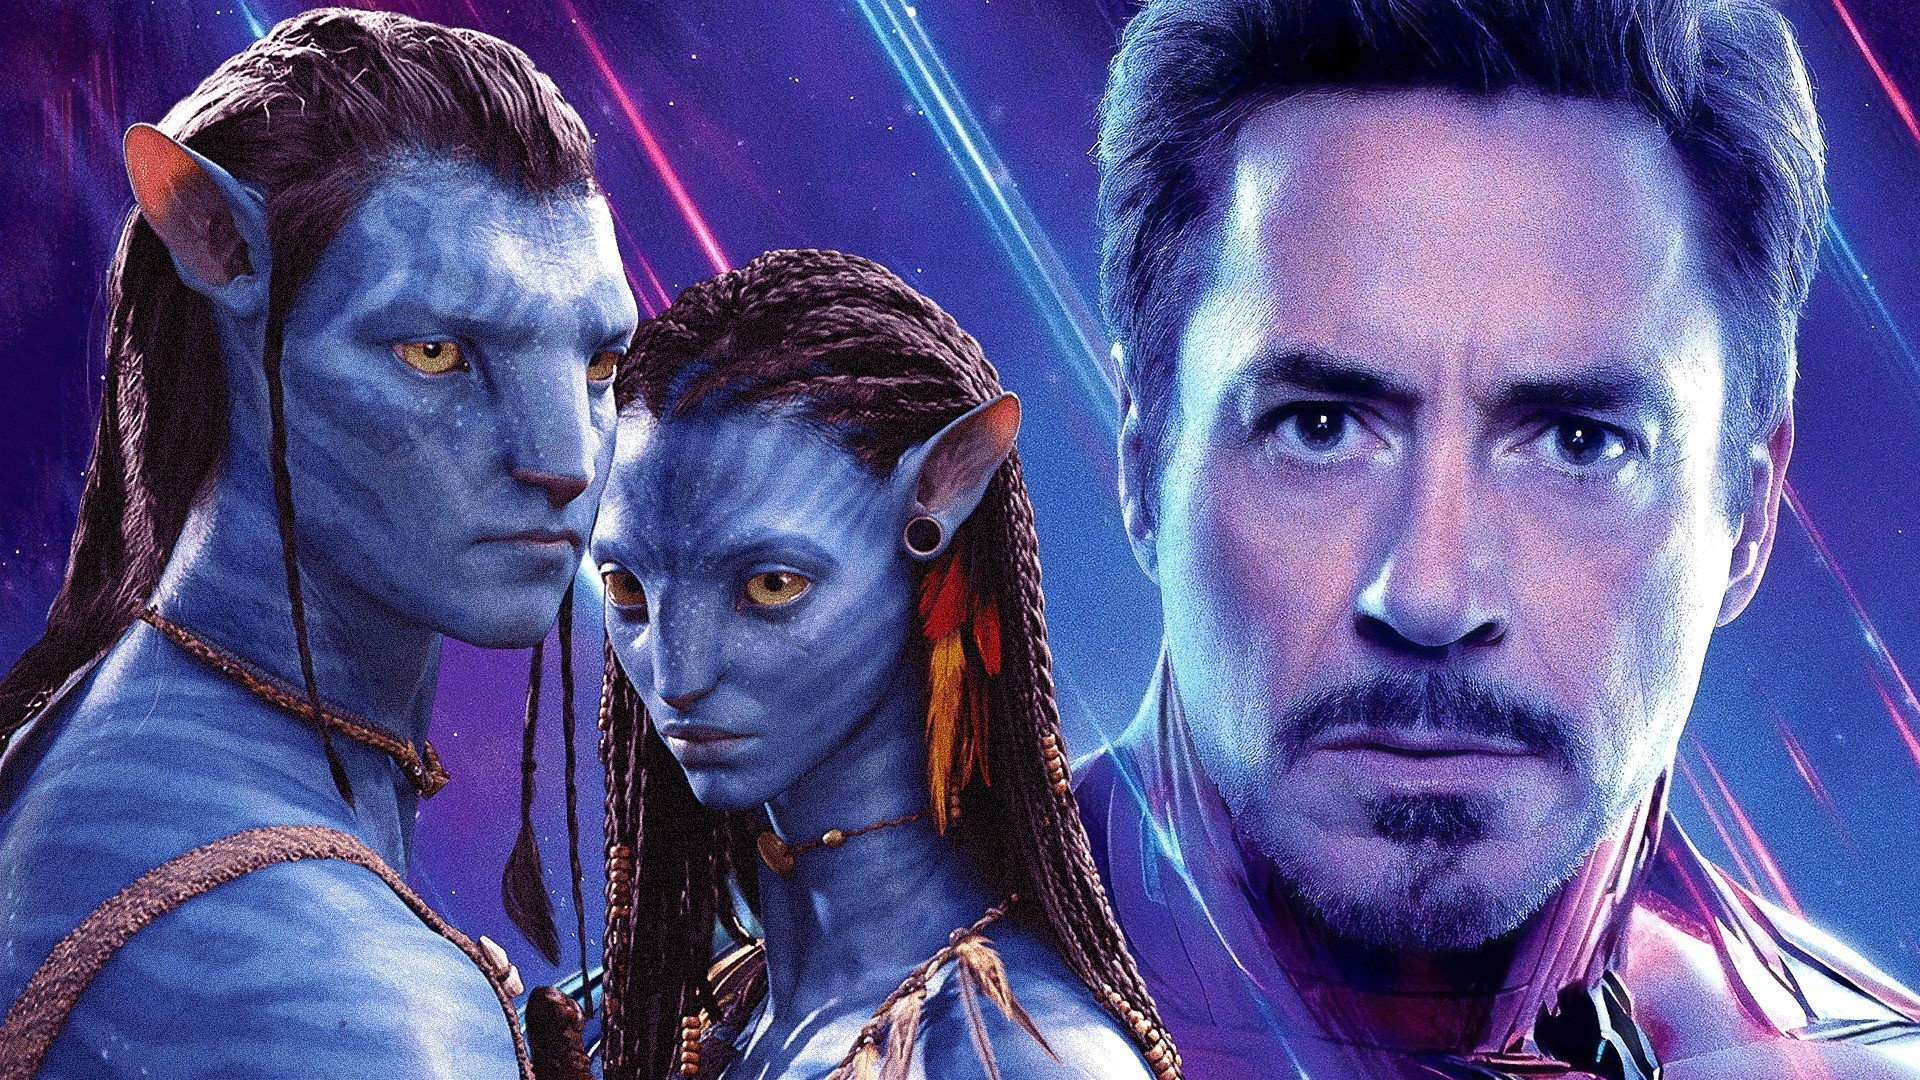 Ako film Avengers Endgame porazil Avatara